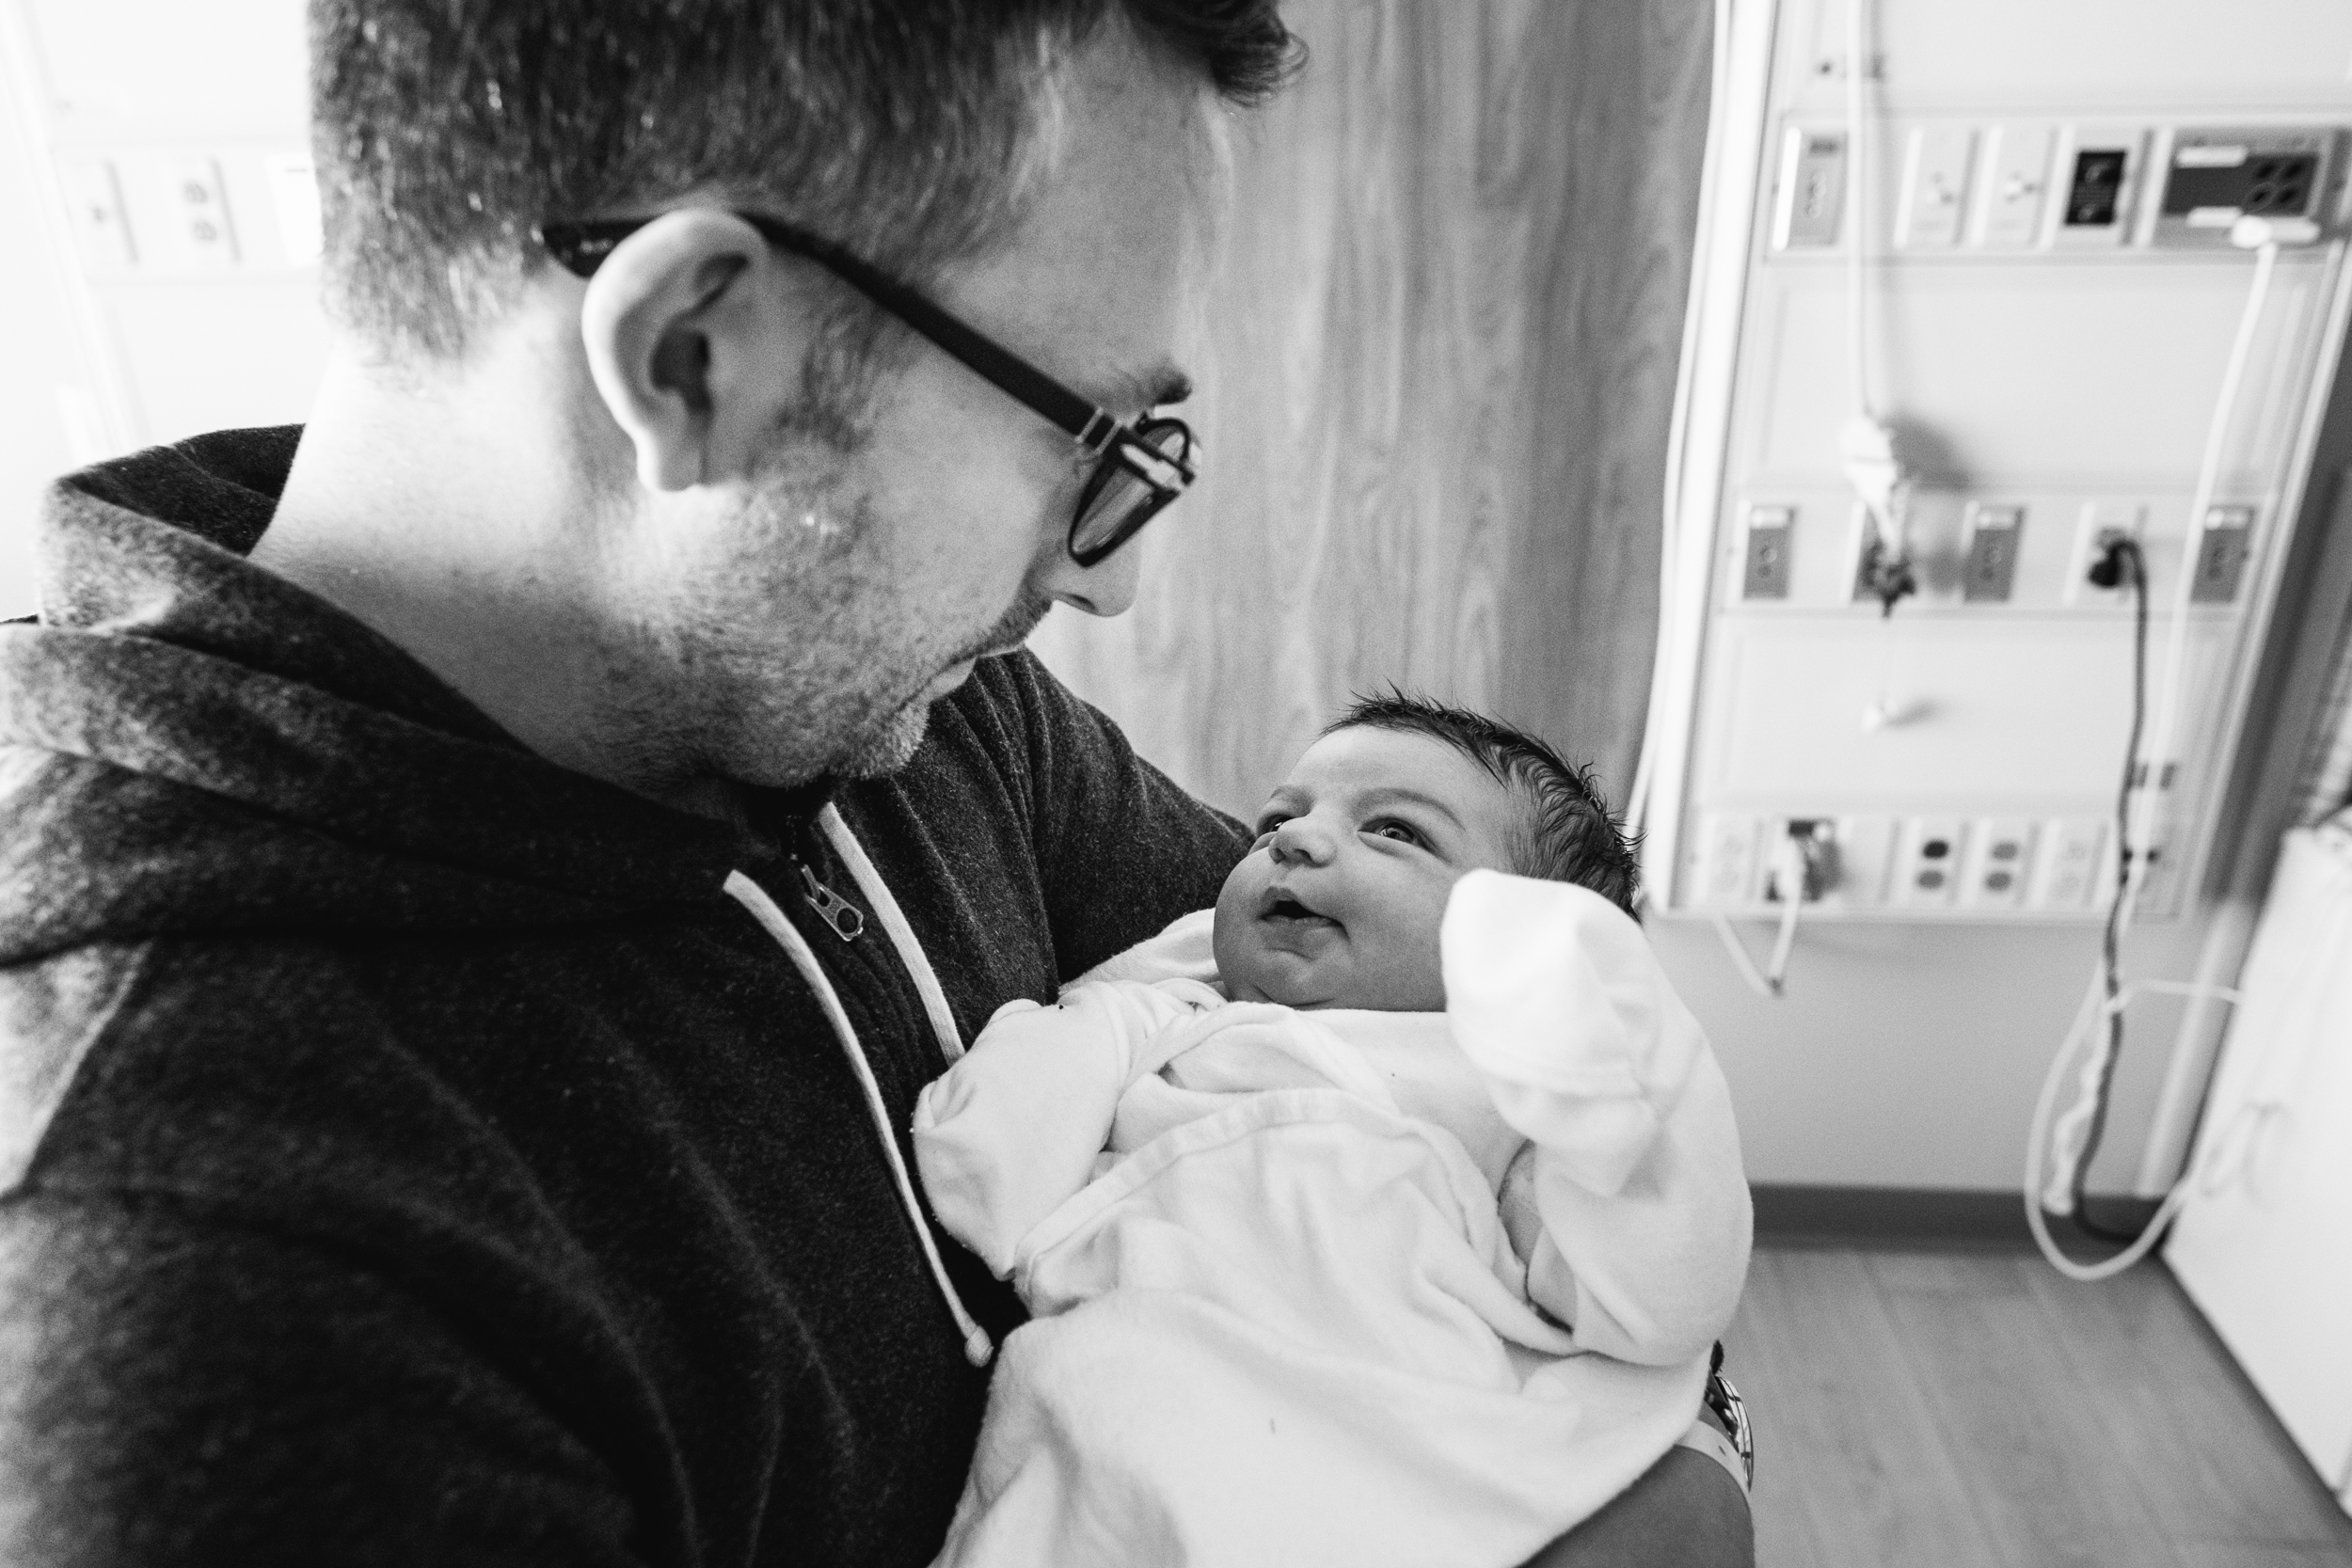 Baby gazing lovingly at dad